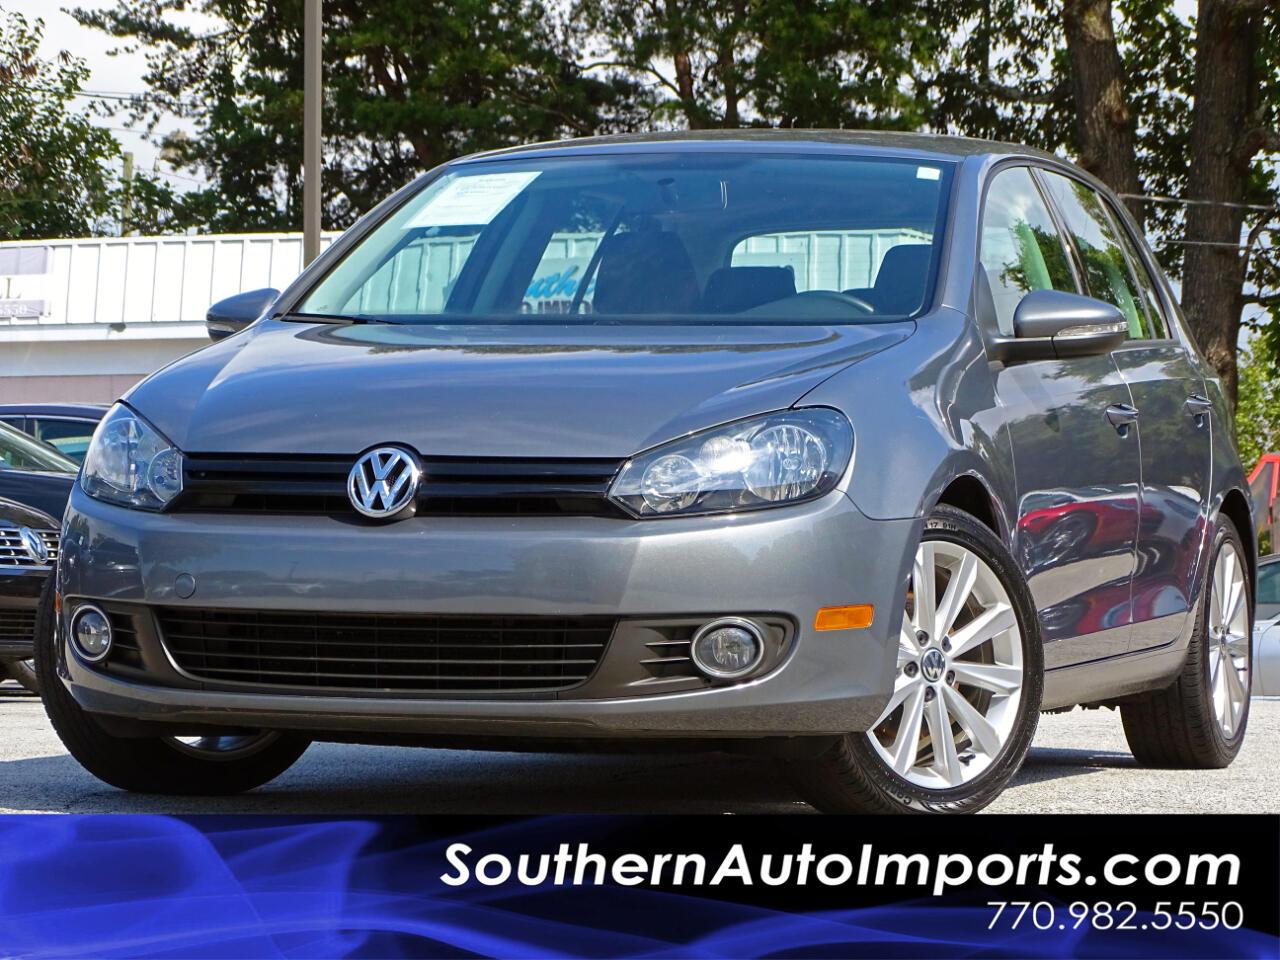 2014 Volkswagen Golf 2.0L TDI w/Touch Screen